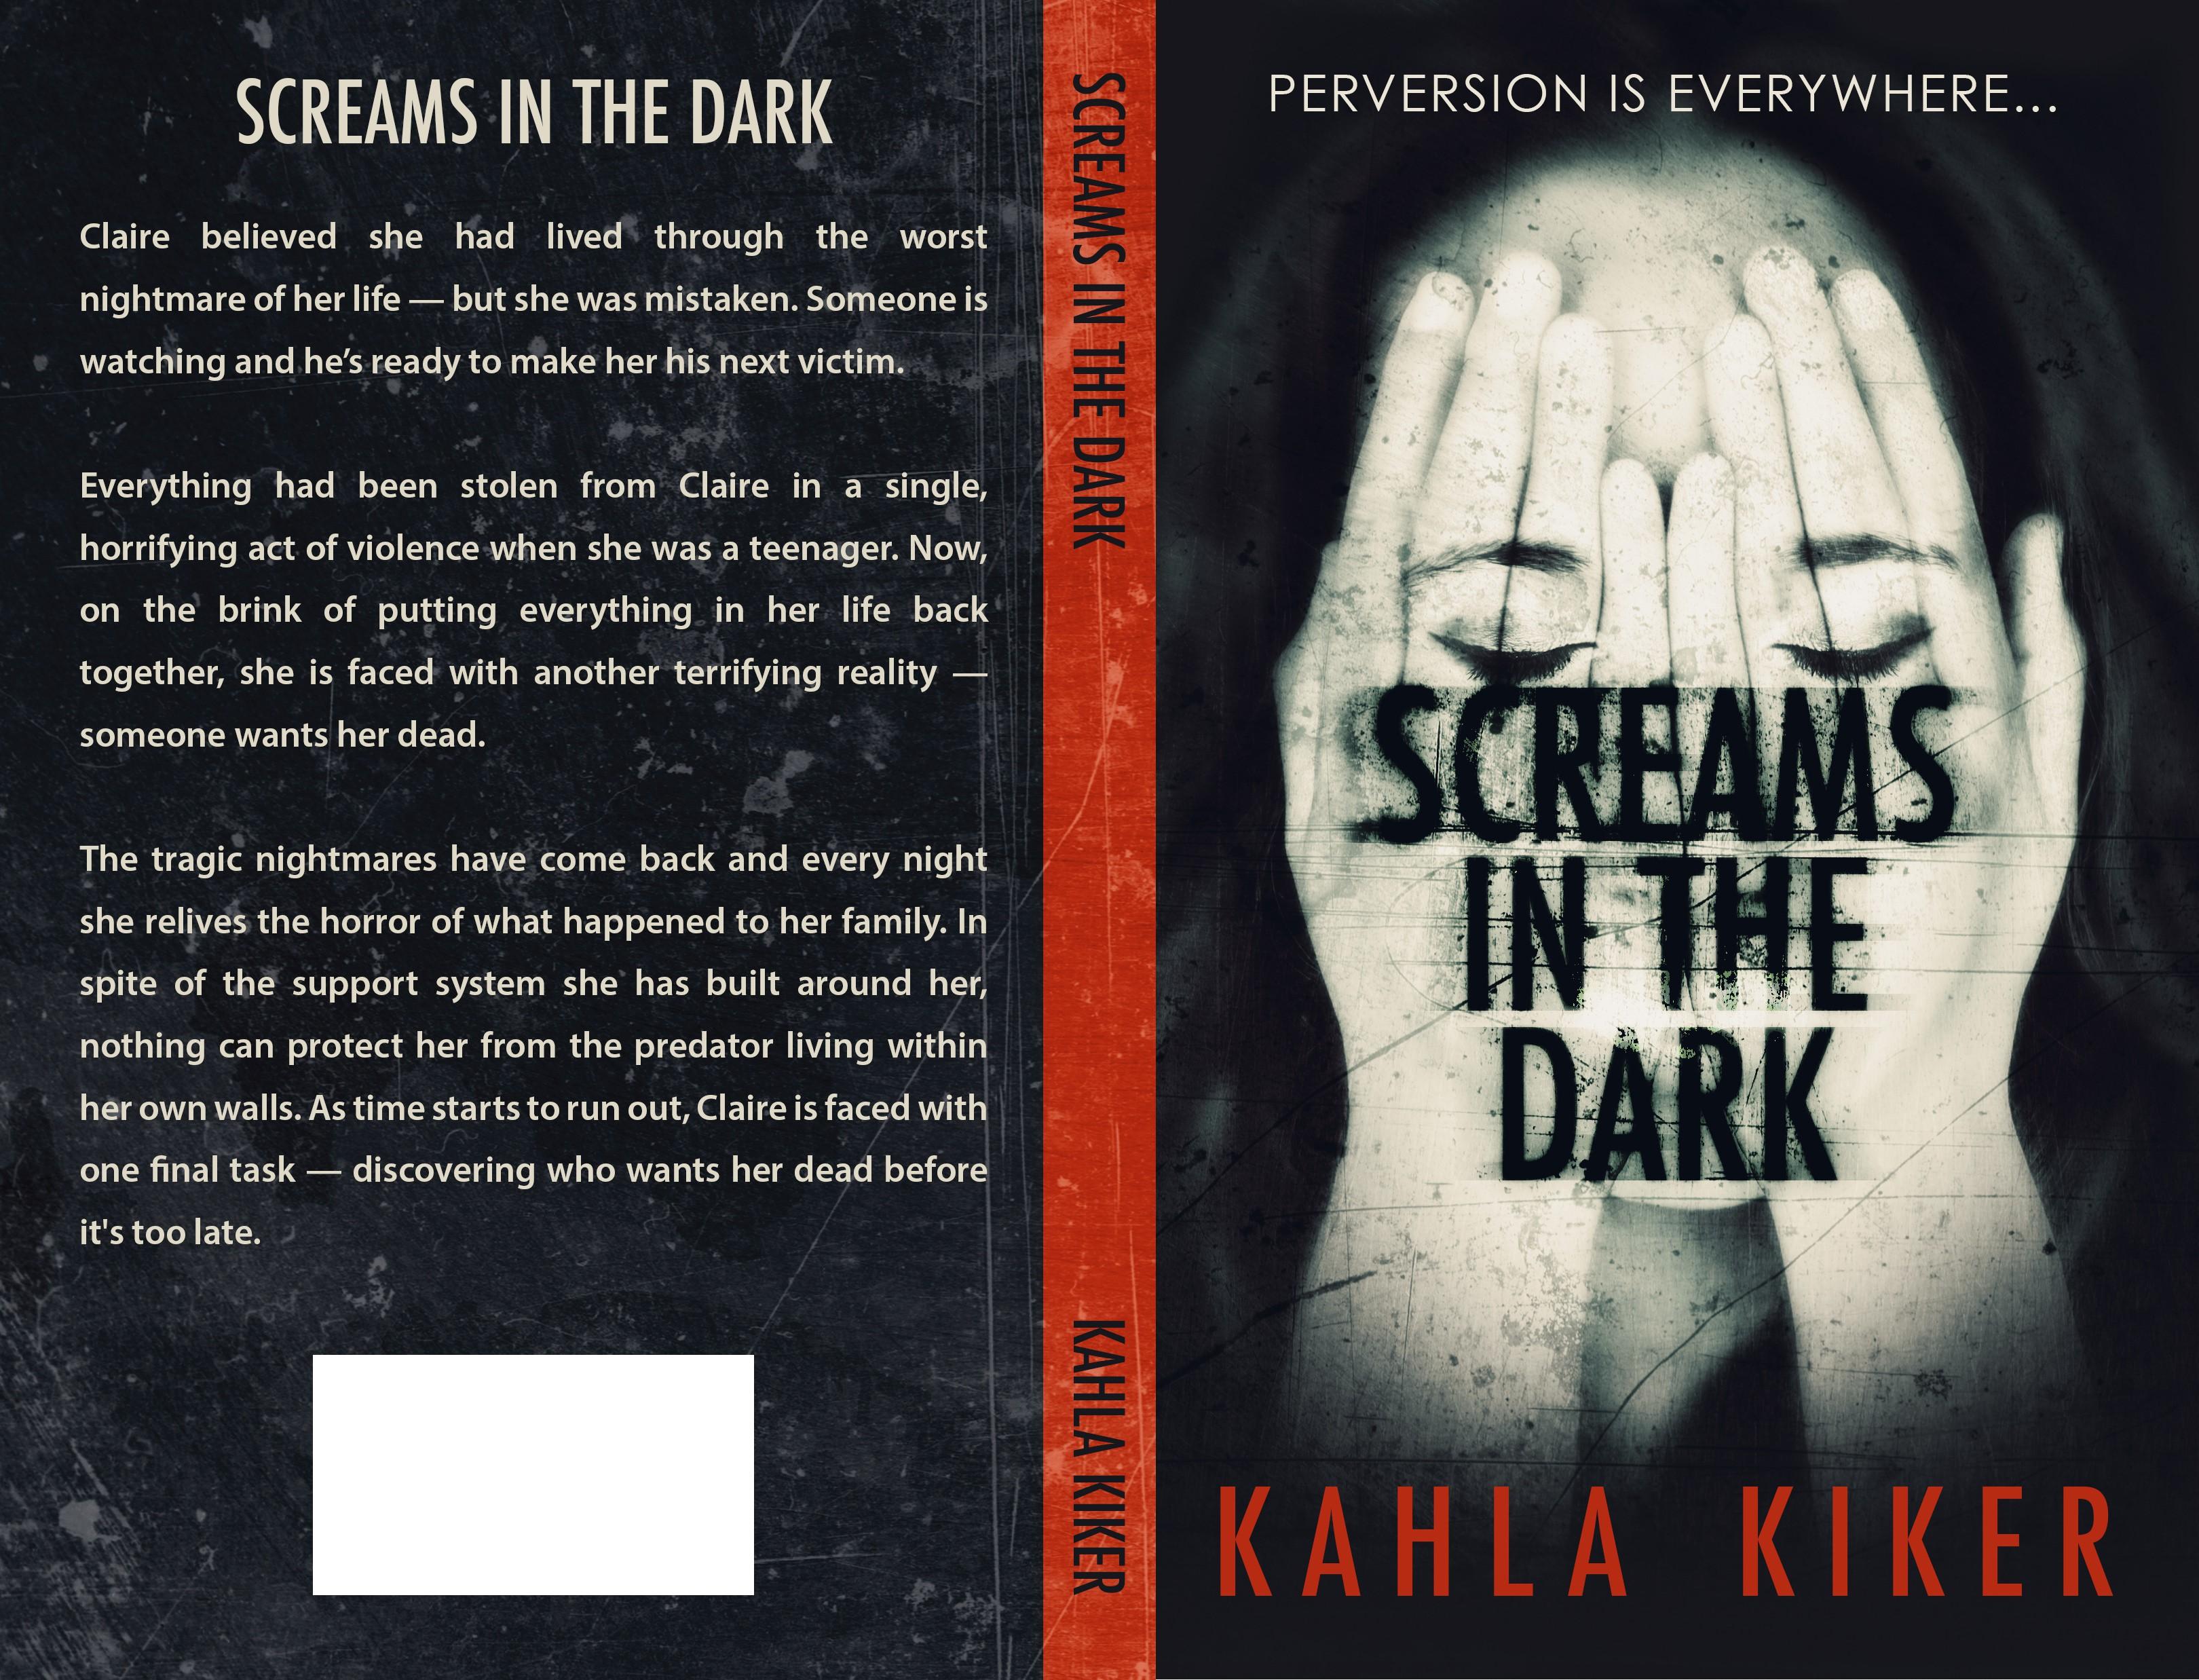 Screams in the Dark book cover needed